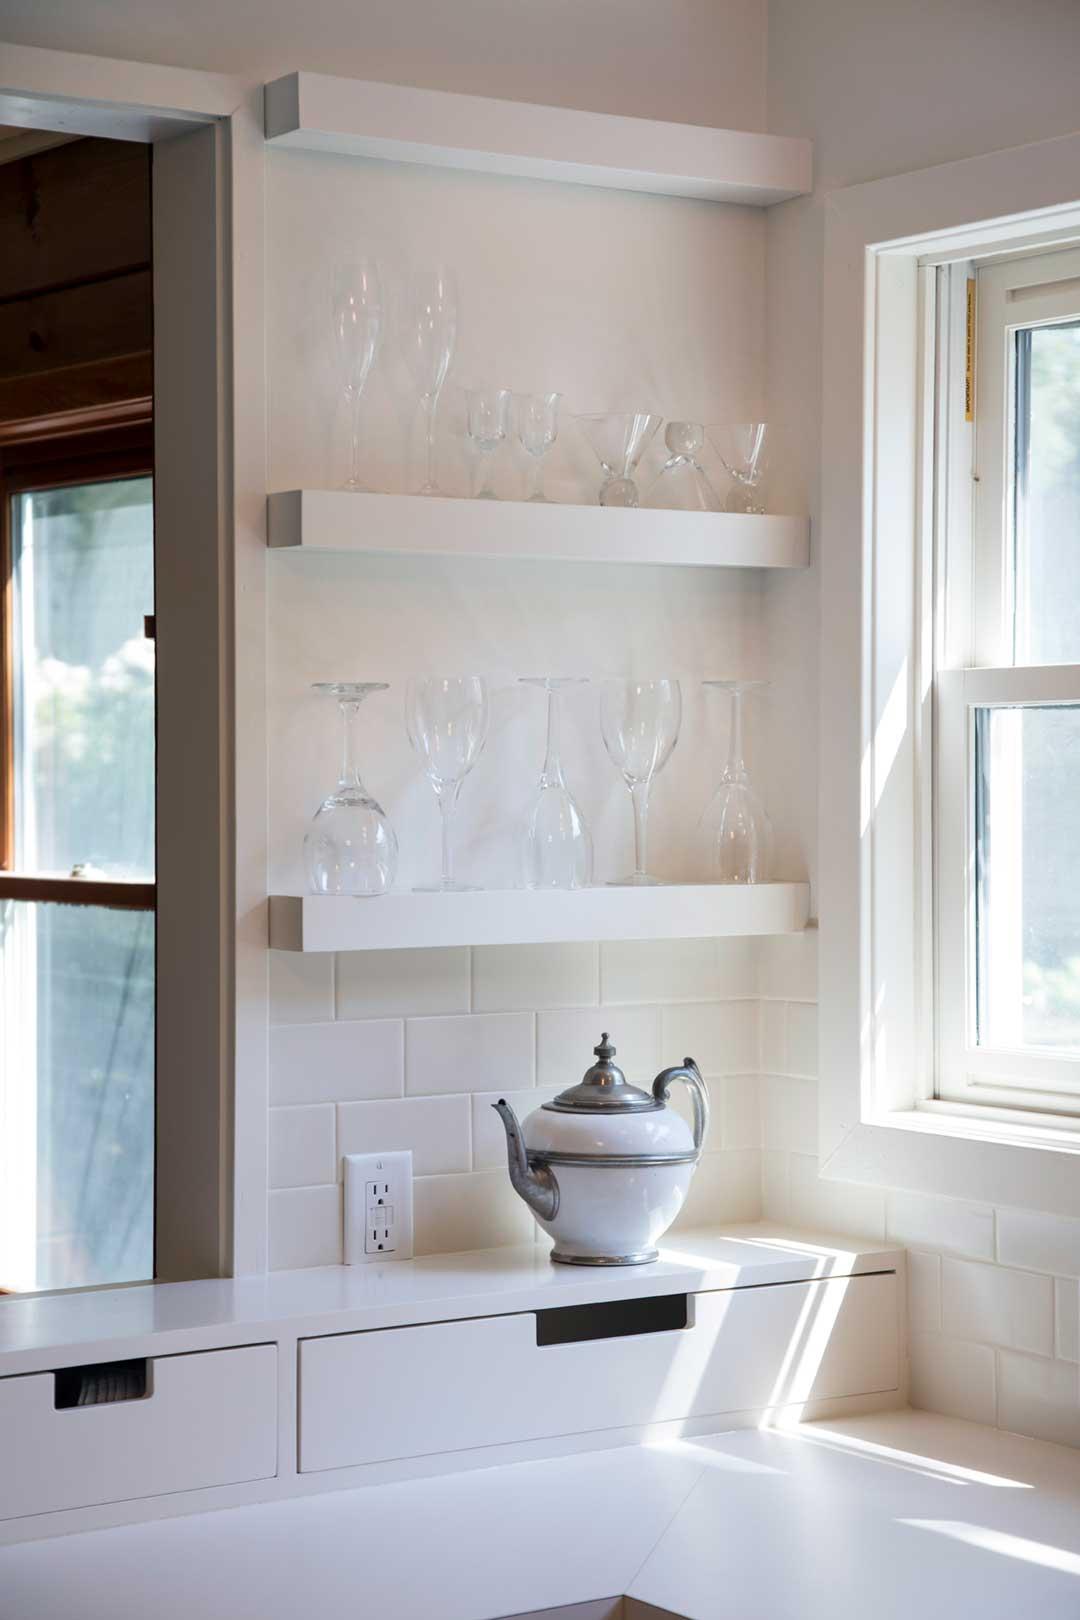 Glenway-WI-Modern-Kitchen-Remodel-Open-Shelving